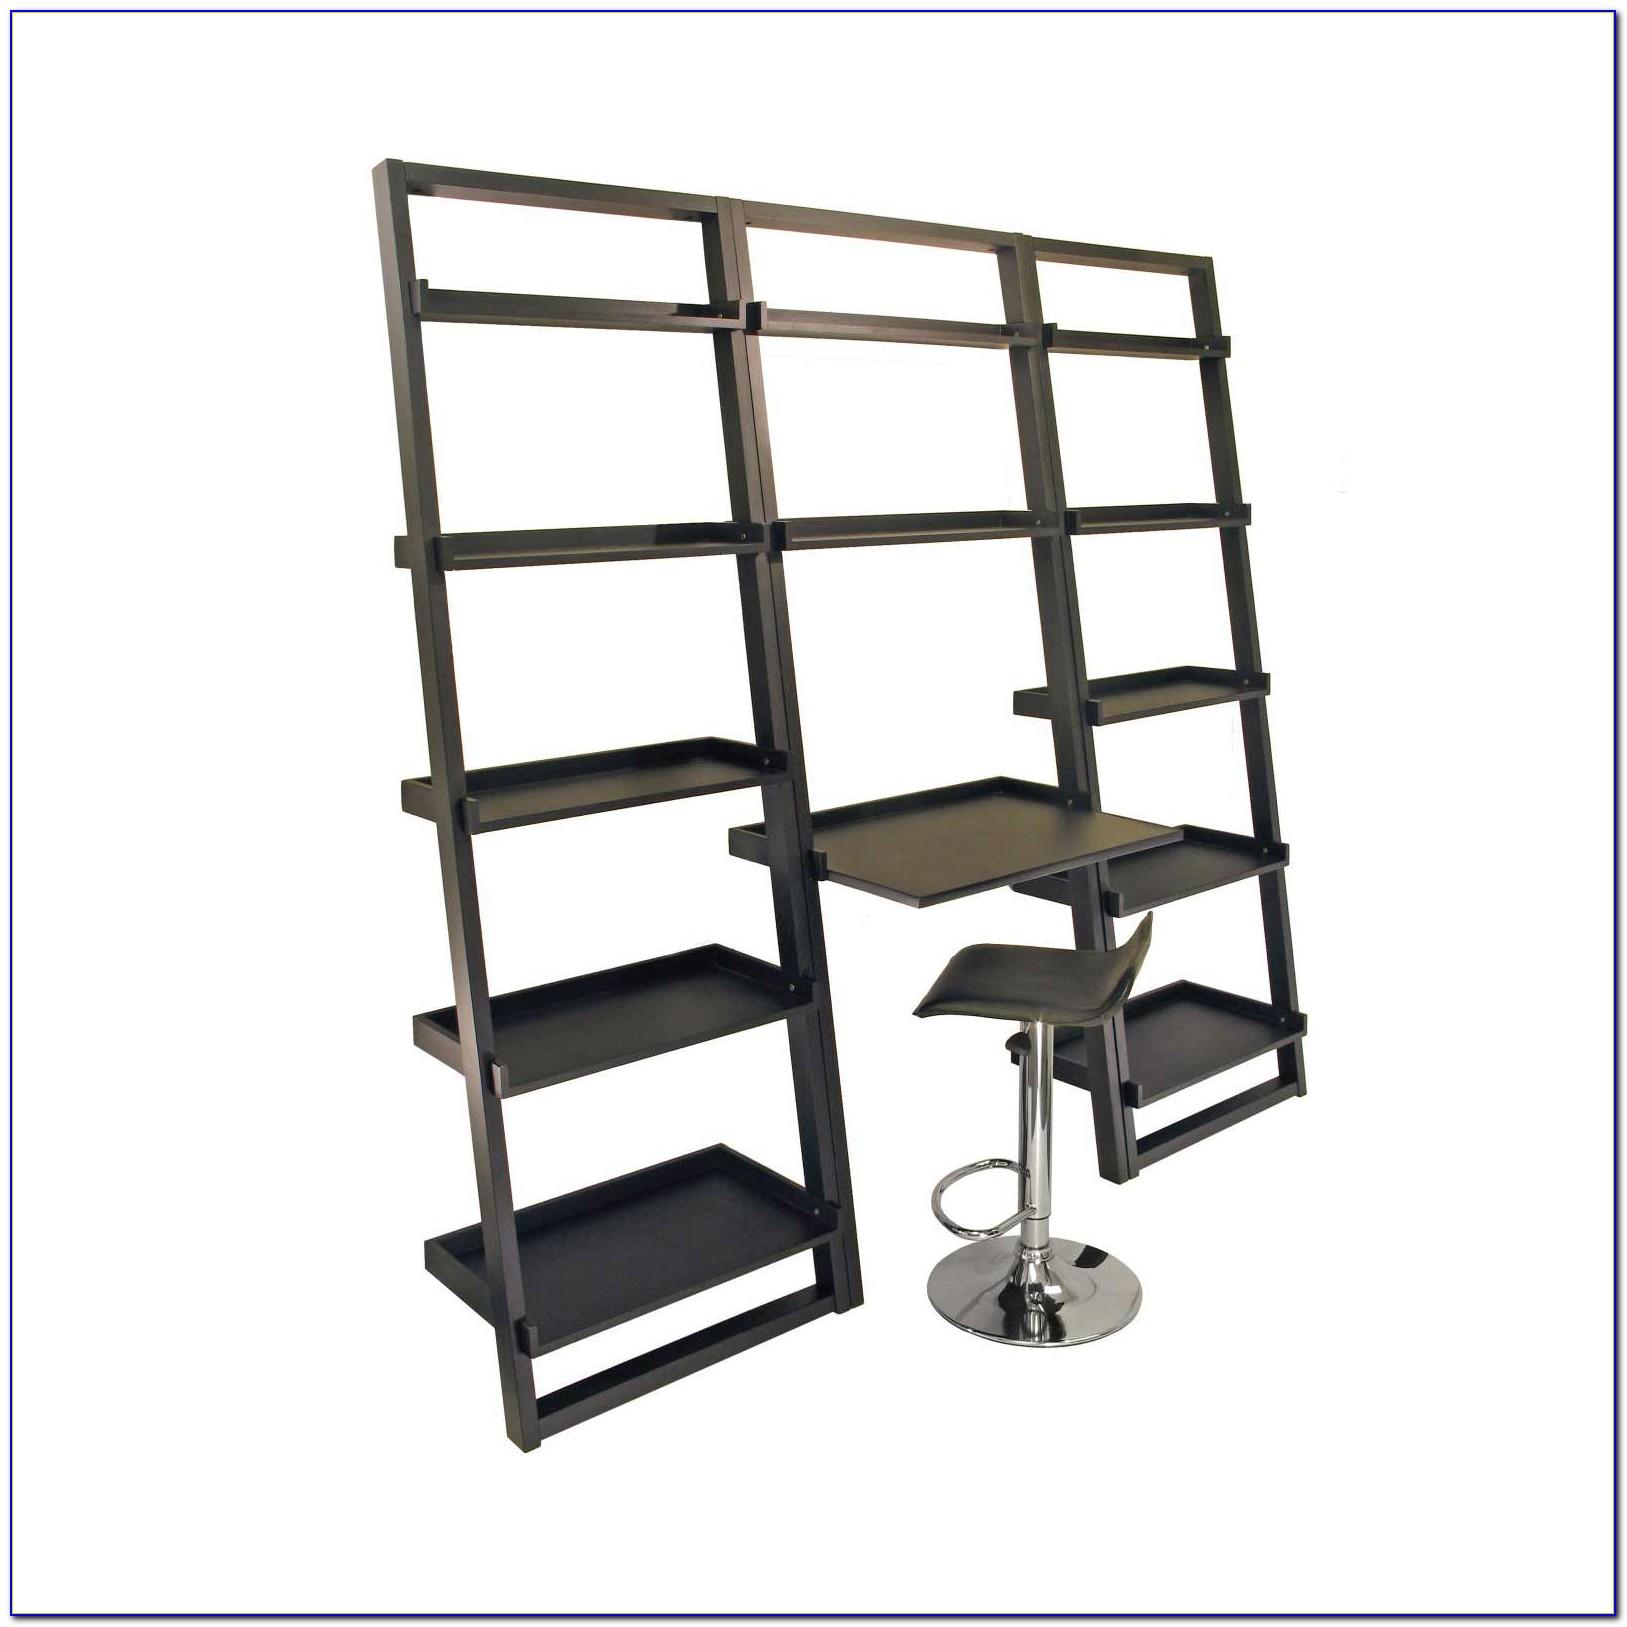 Leaning Desk With Shelves Uk